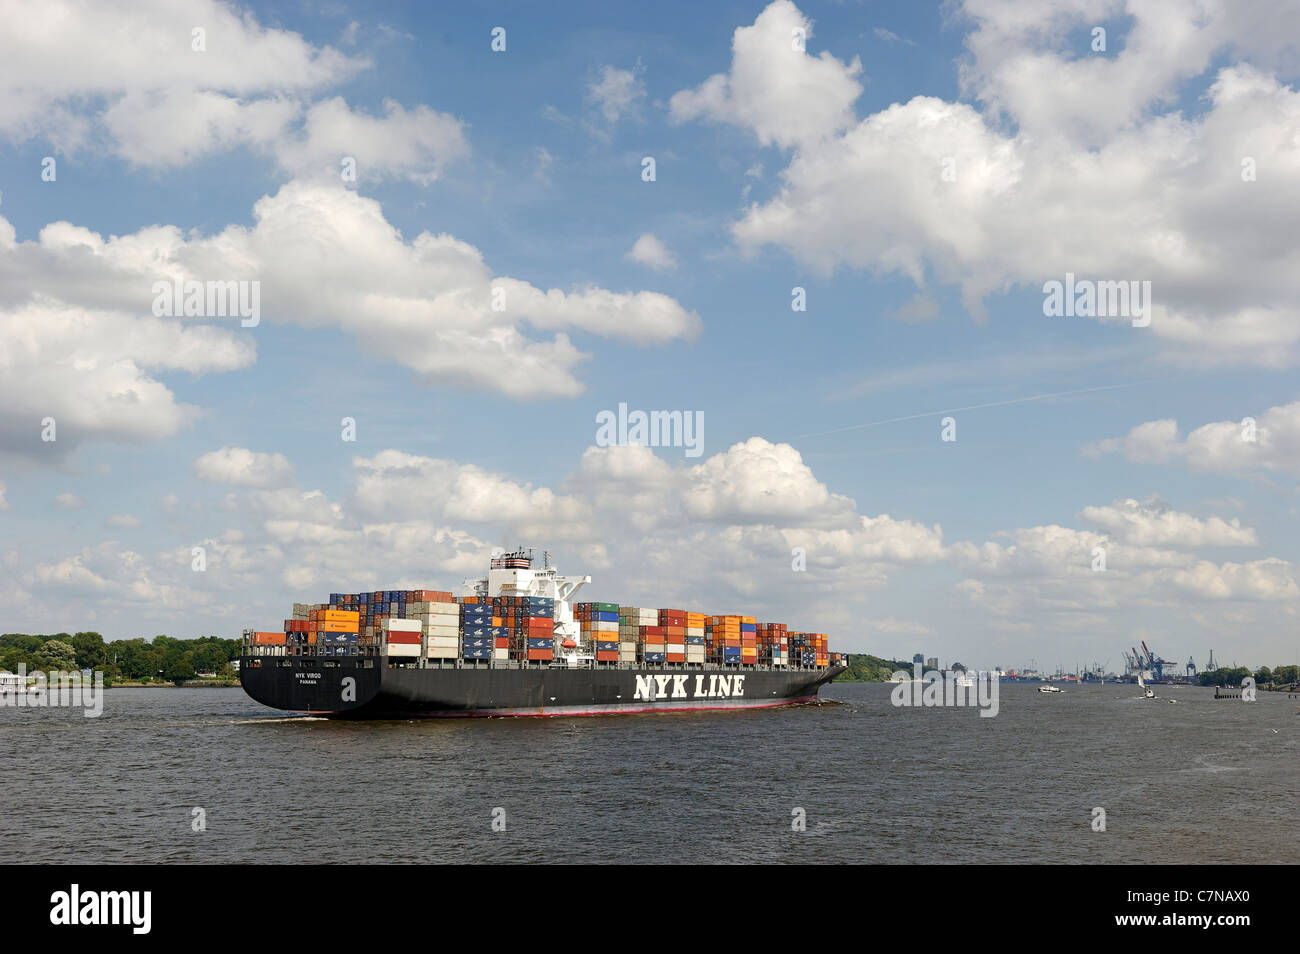 NYK VIRGO super freighter entering port, Finkenwerder, Port of Hamburg, Germany, Europe Stock Photo